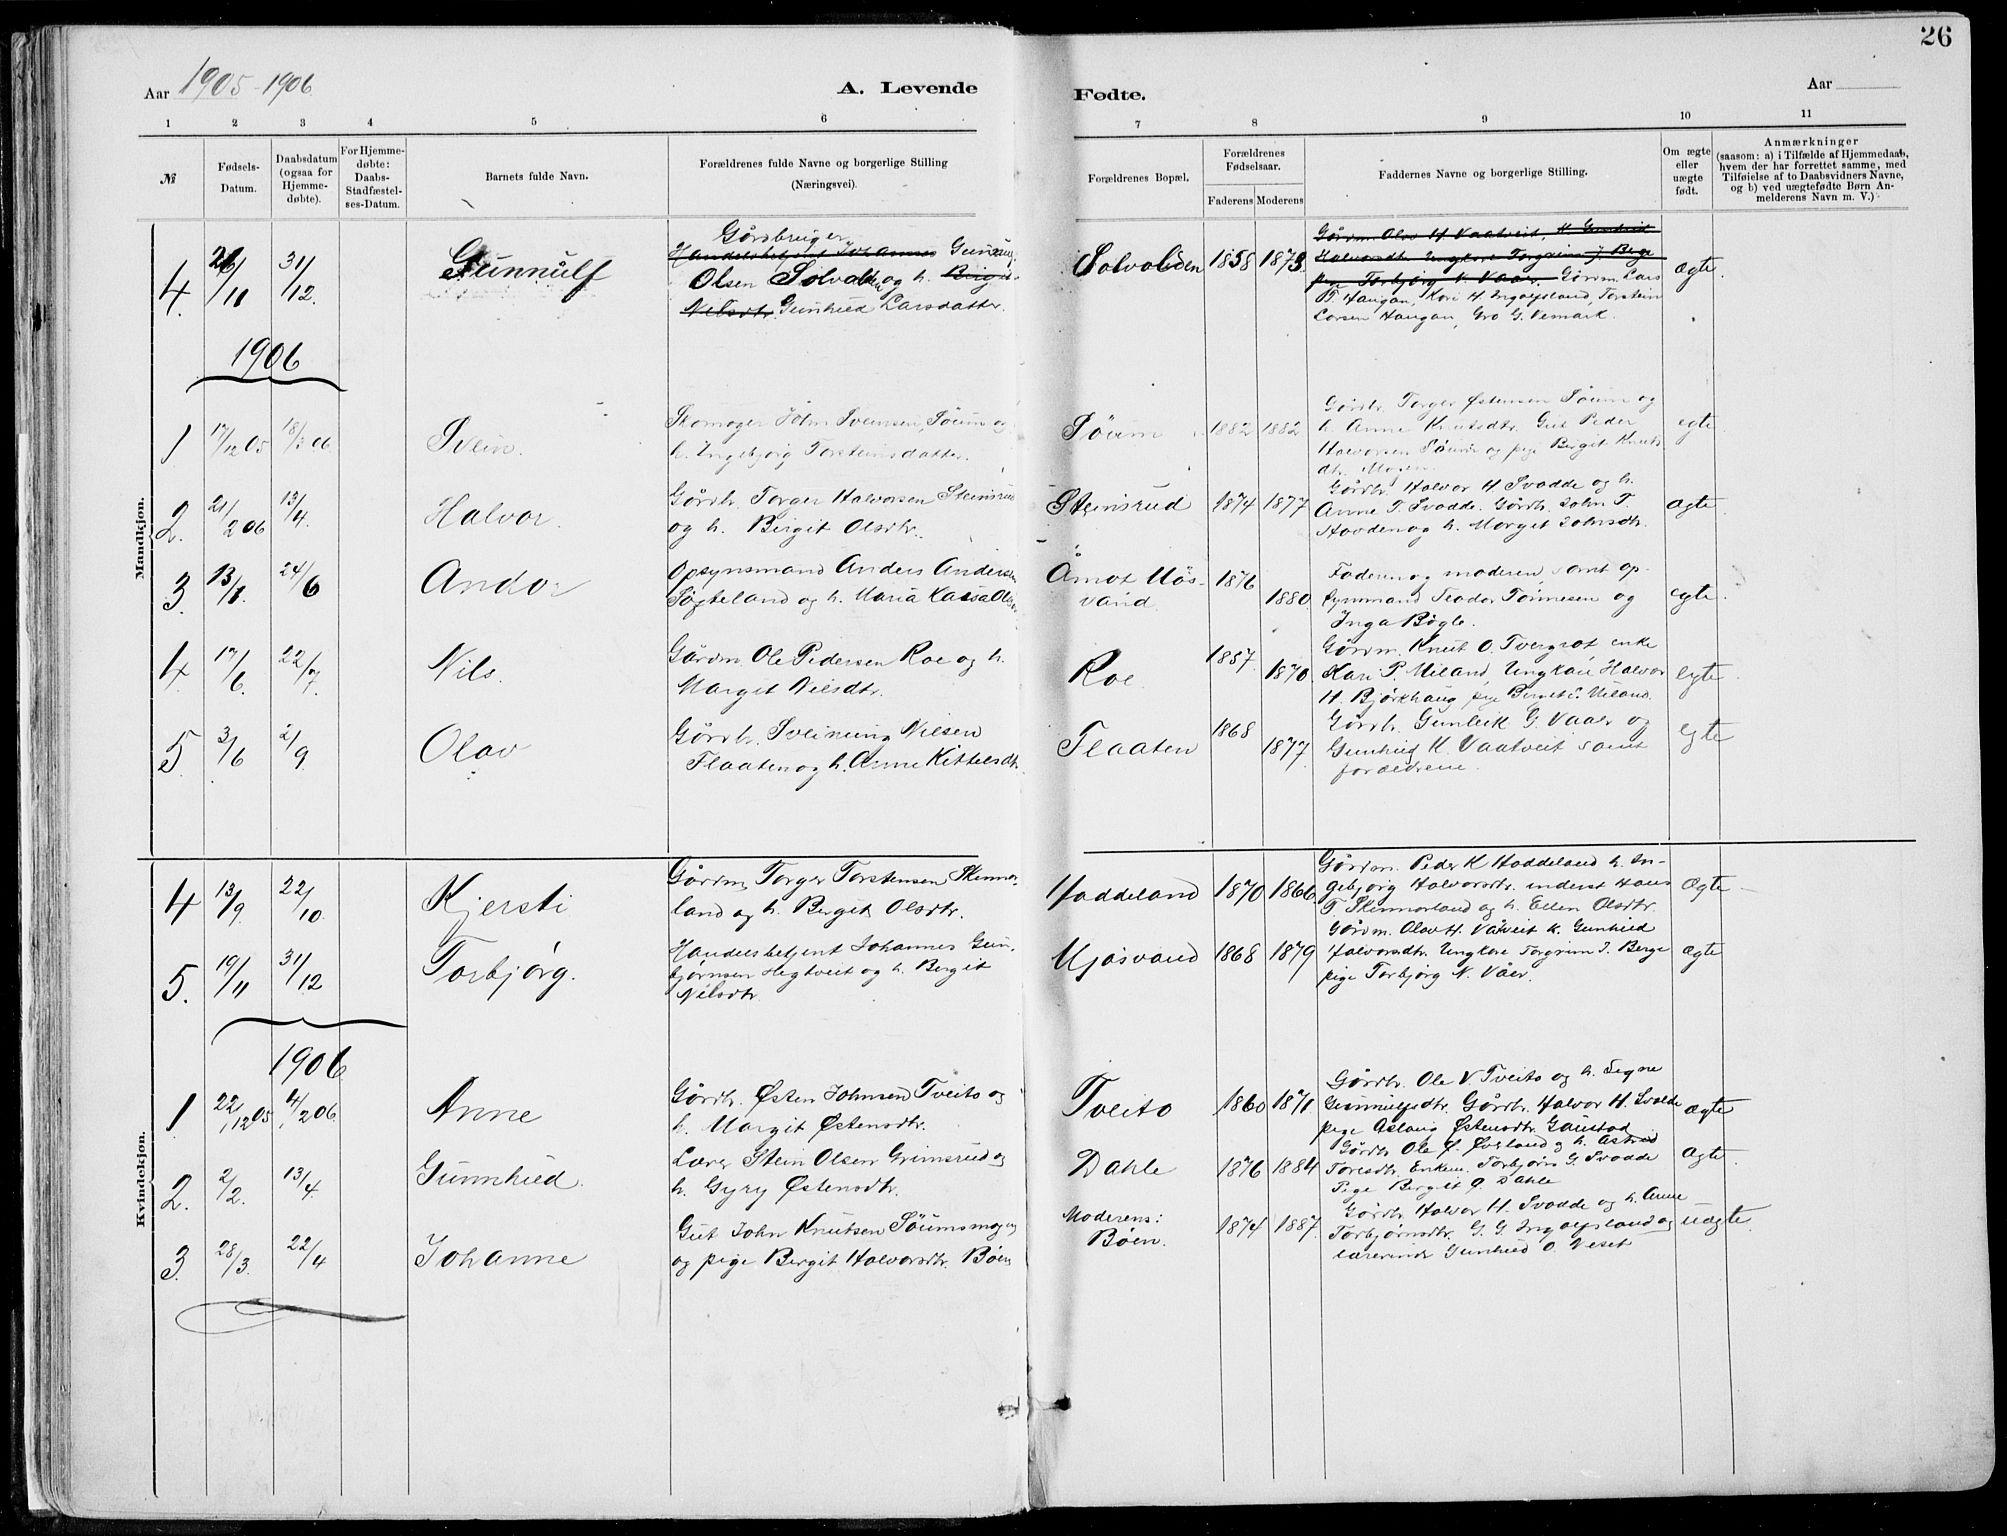 SAKO, Rjukan kirkebøker, F/Fa/L0001: Parish register (official) no. 1, 1878-1912, p. 26